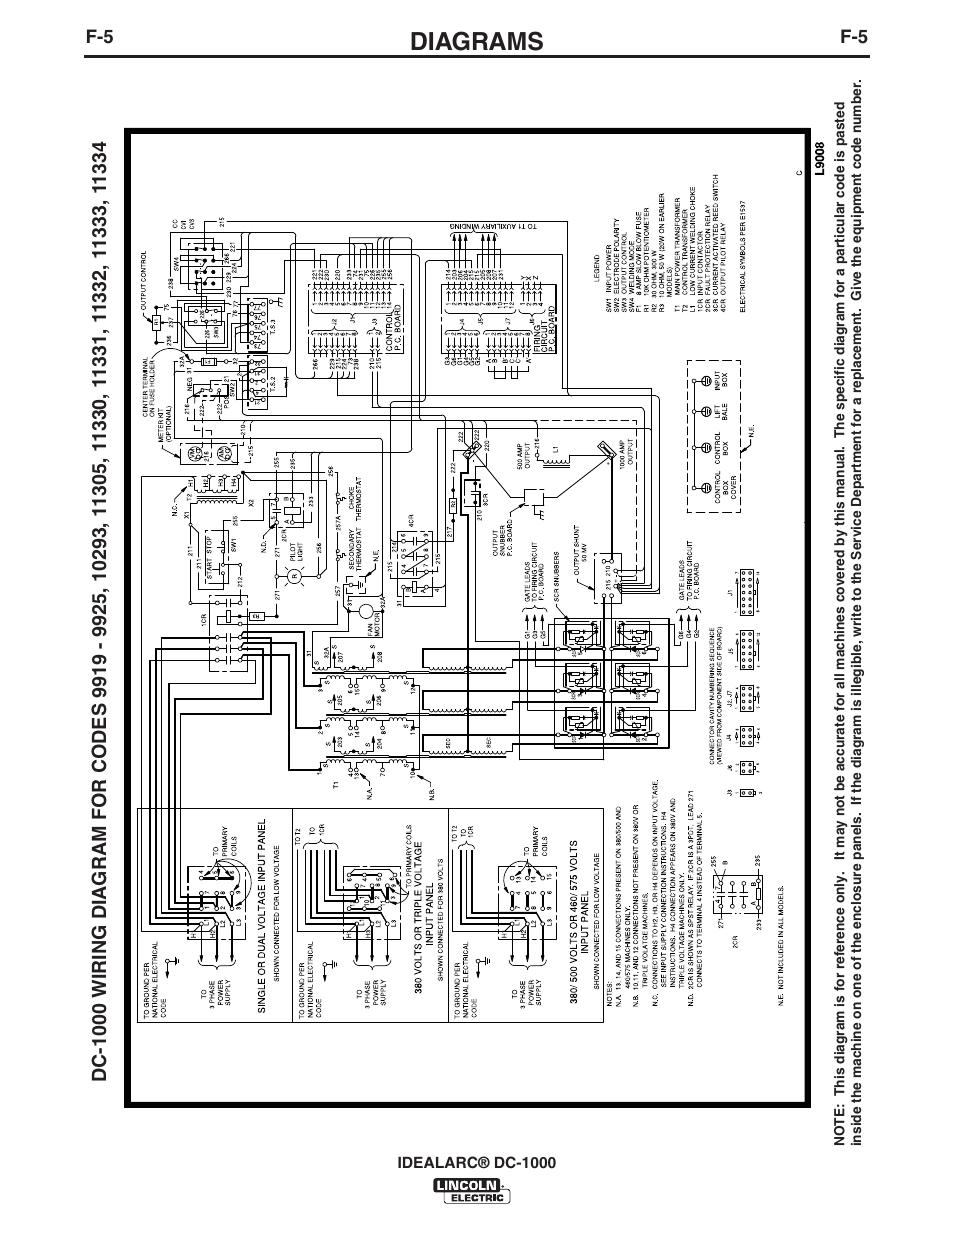 medium resolution of diagrams lincoln electric im420 idealarc dc 1000 user manual lincoln dc 1000 wiring diagram diagrams